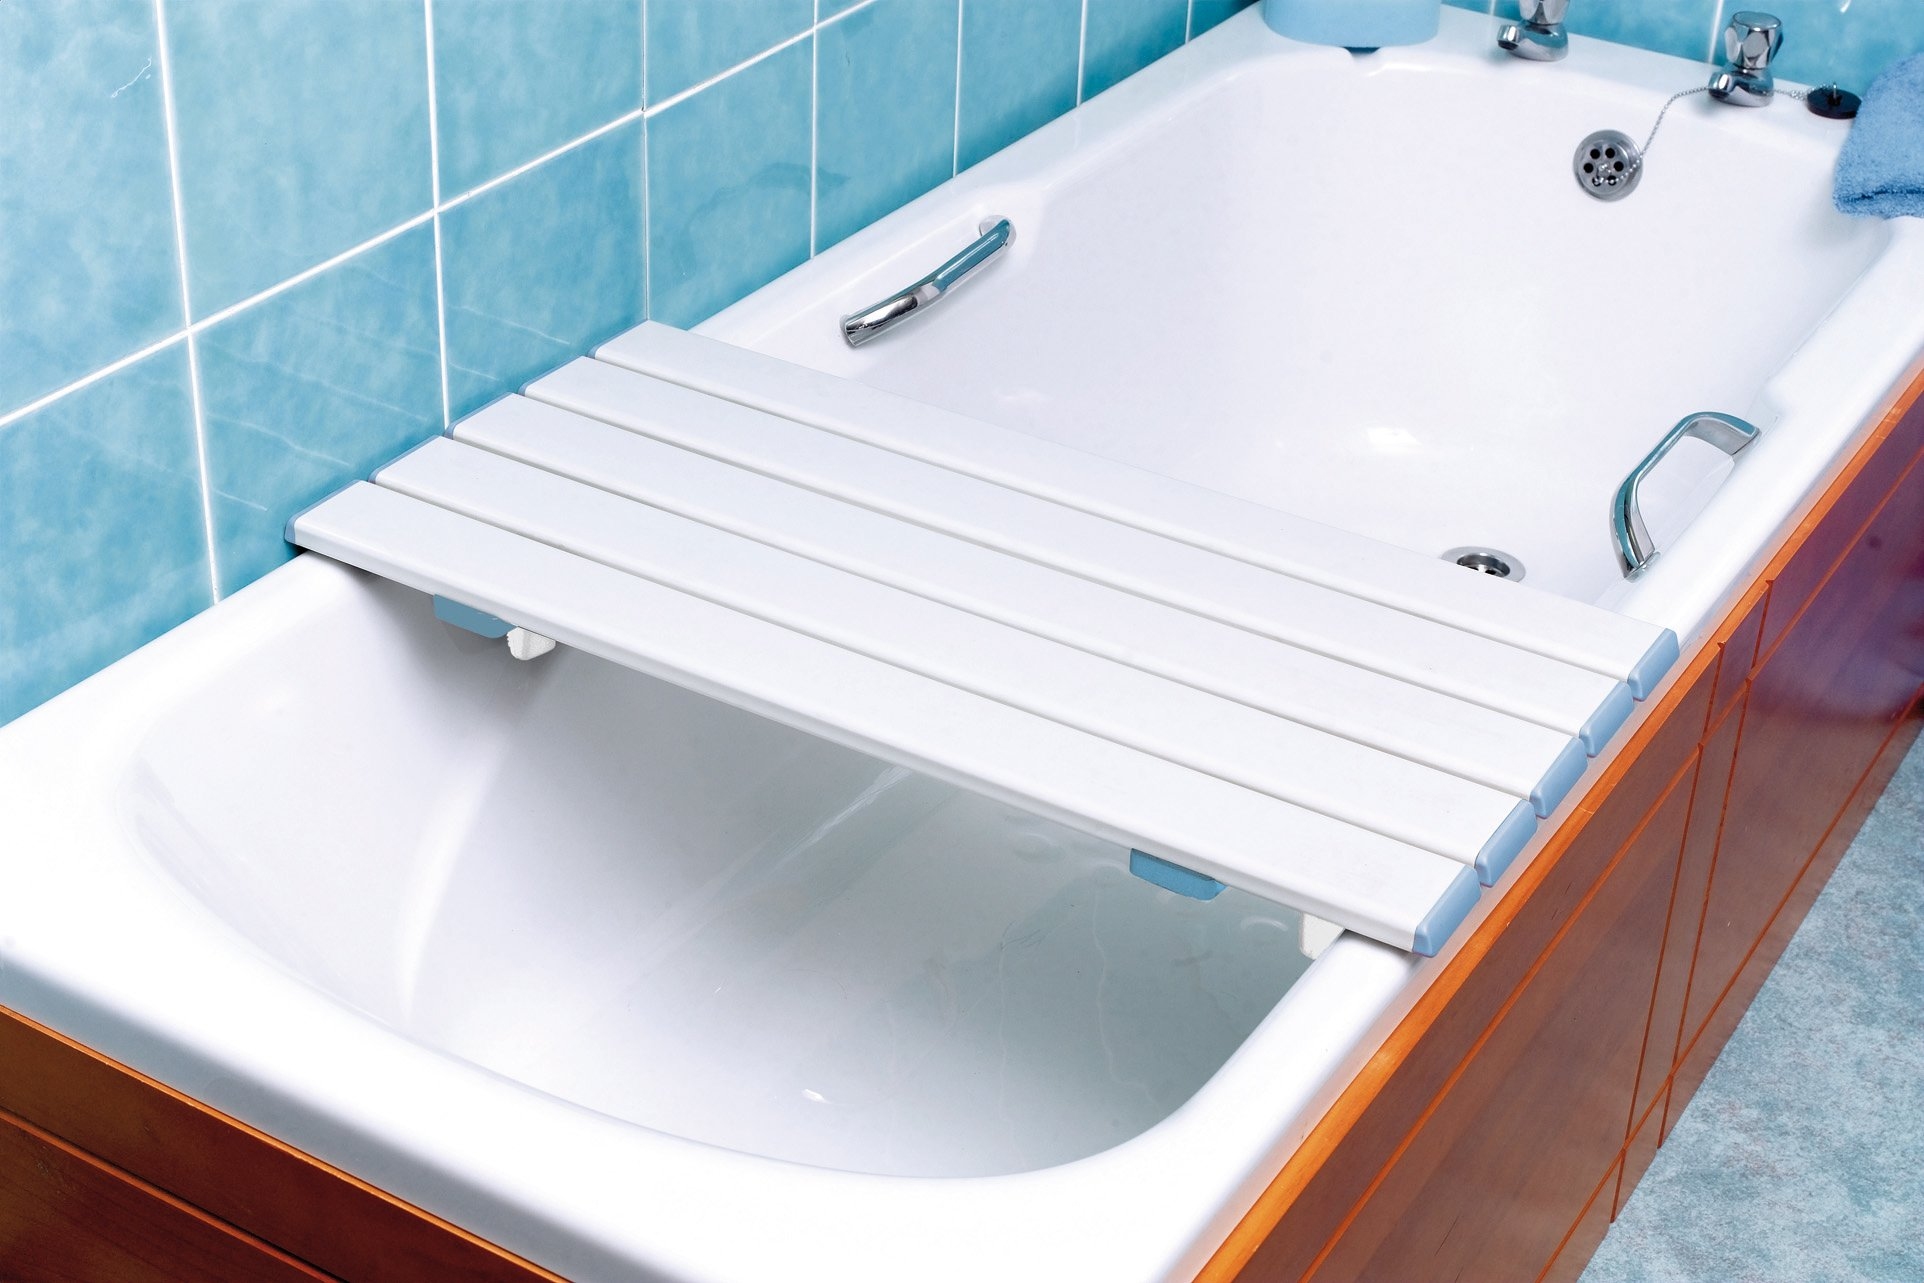 Mensola per vasca da bagno termosifoni in ghisa scheda tecnica - Accessori per vasca da bagno ...